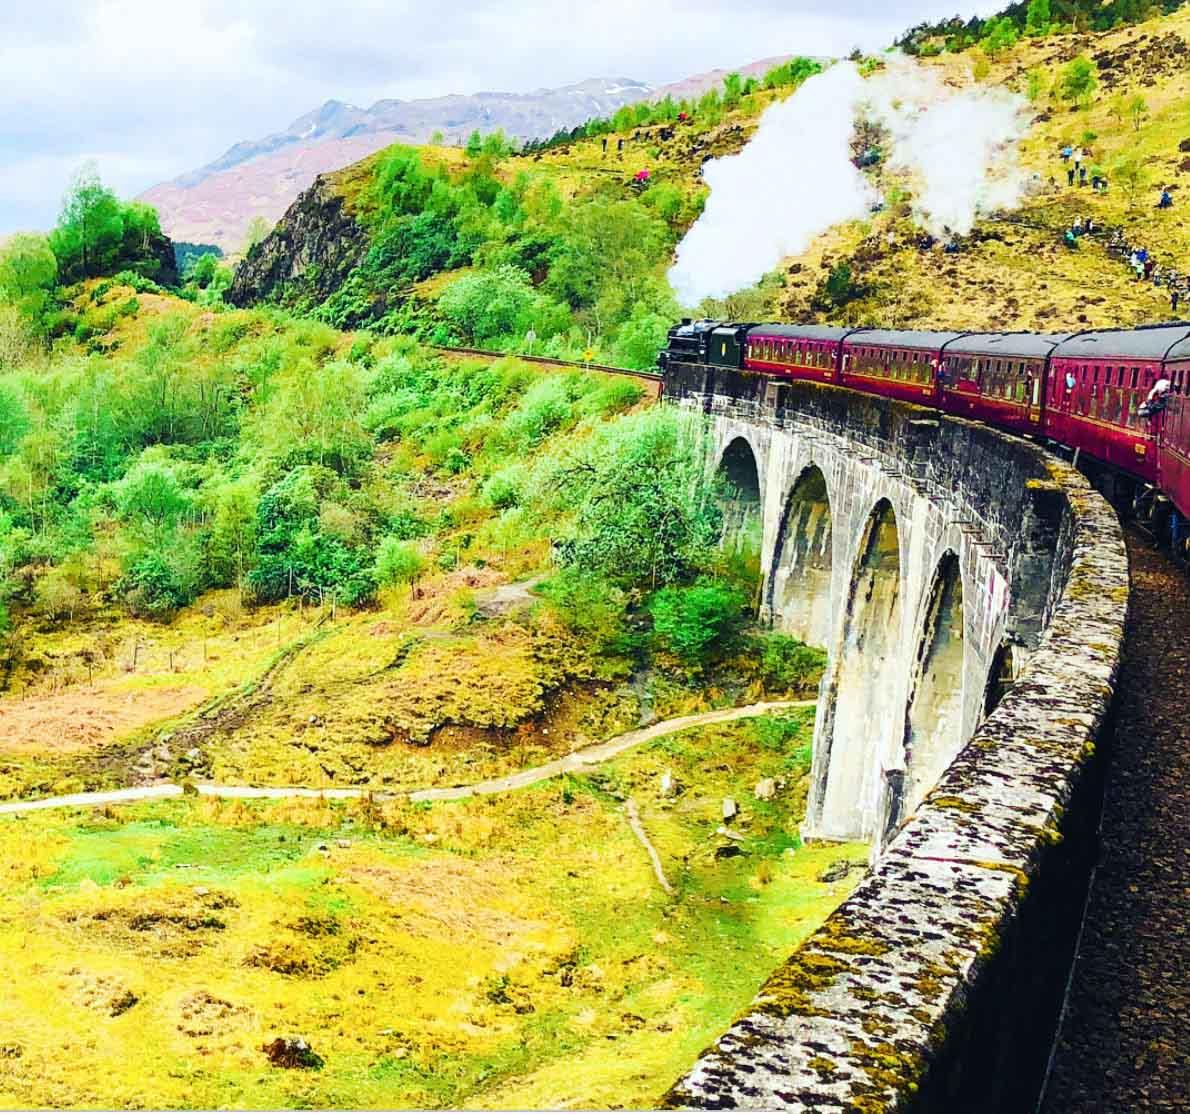 Harry Potter Scotland Glenfinnan Viaduct and train